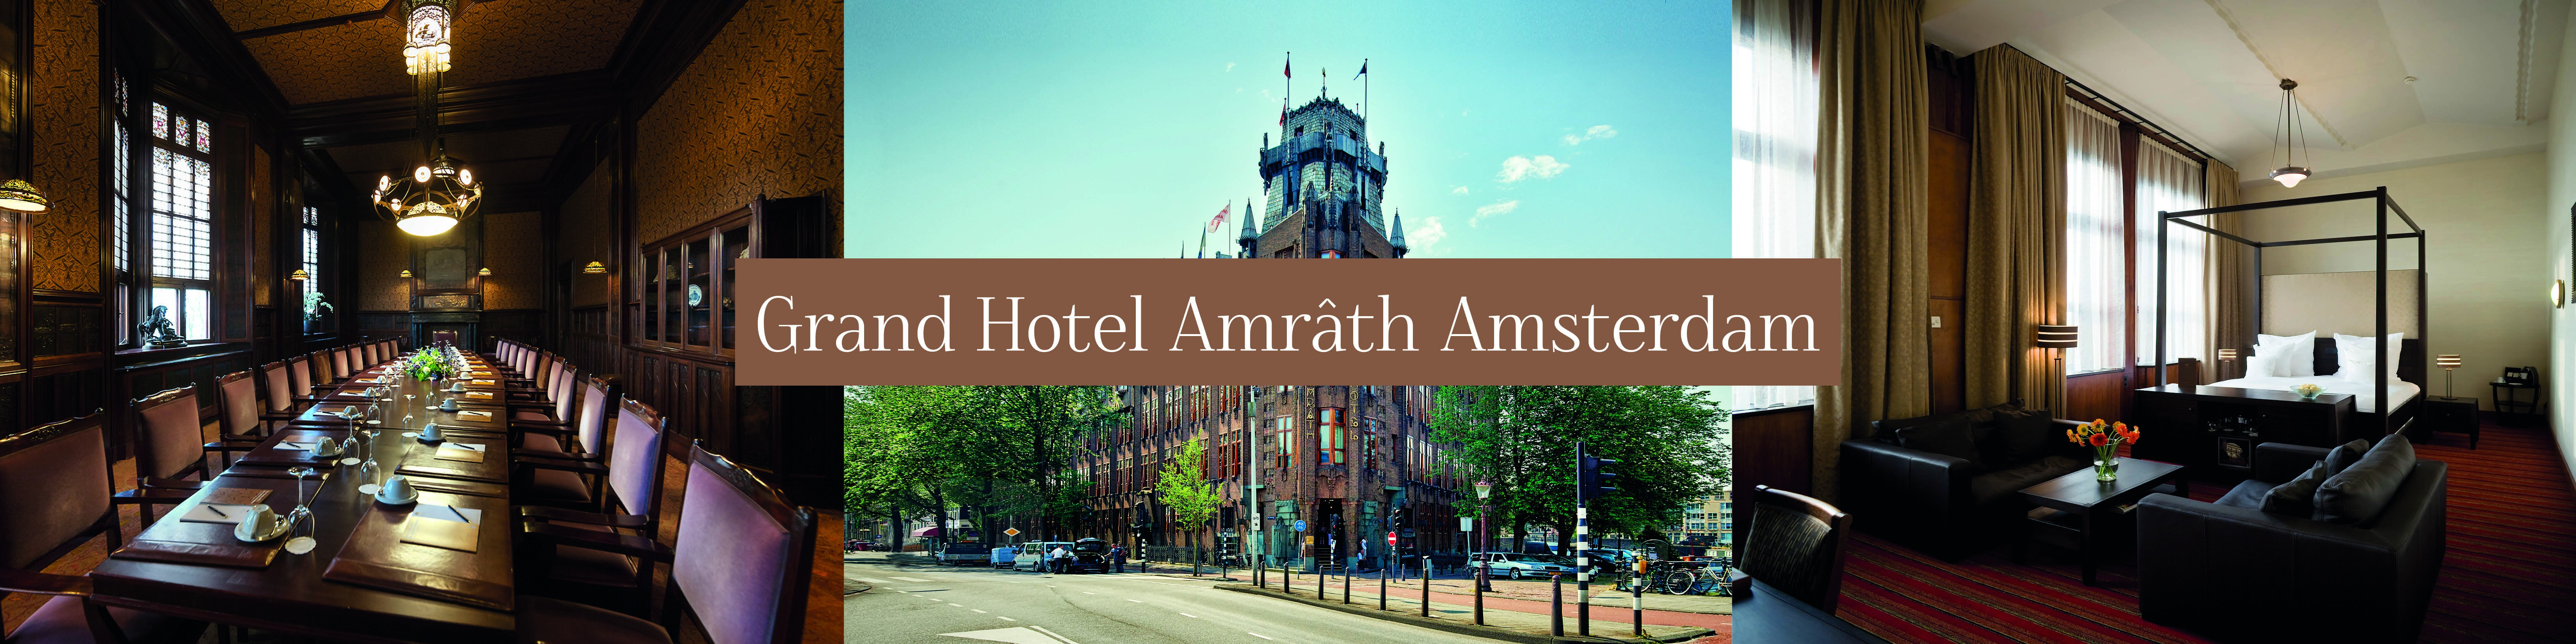 Grand Hotel Amrath Amsterdam Linkedin